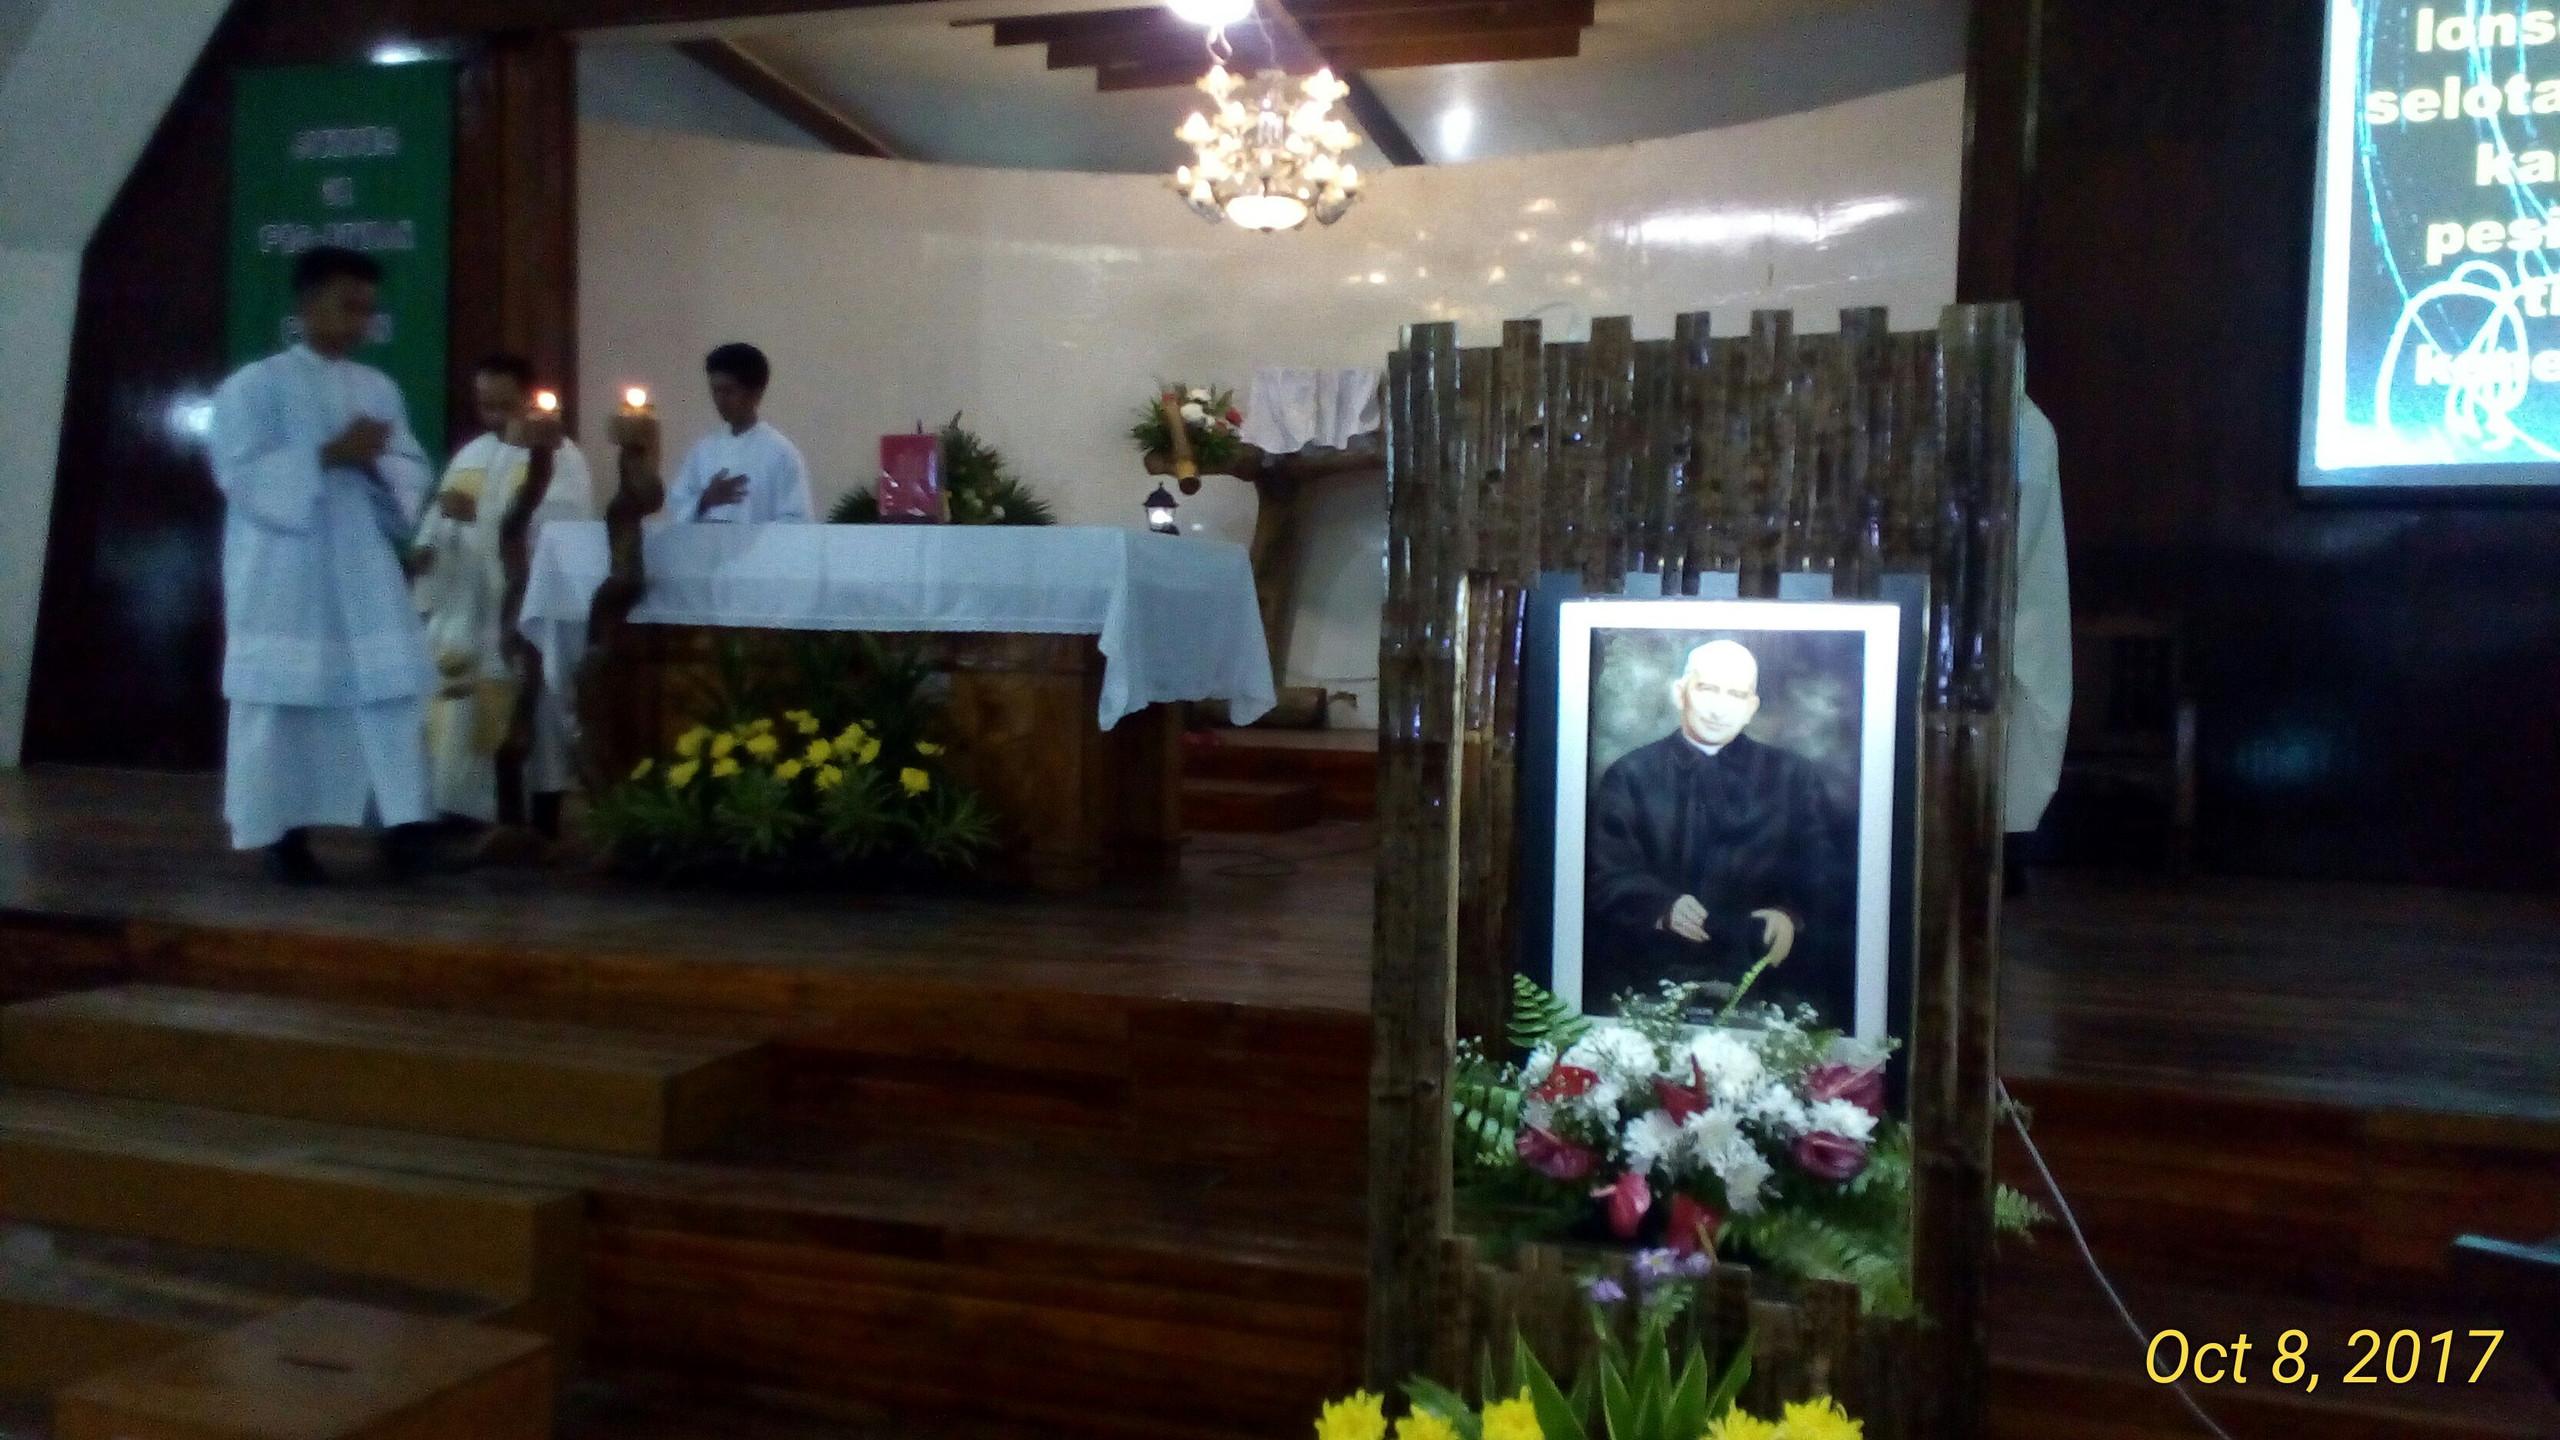 Our Lady Of the Assumption Parish